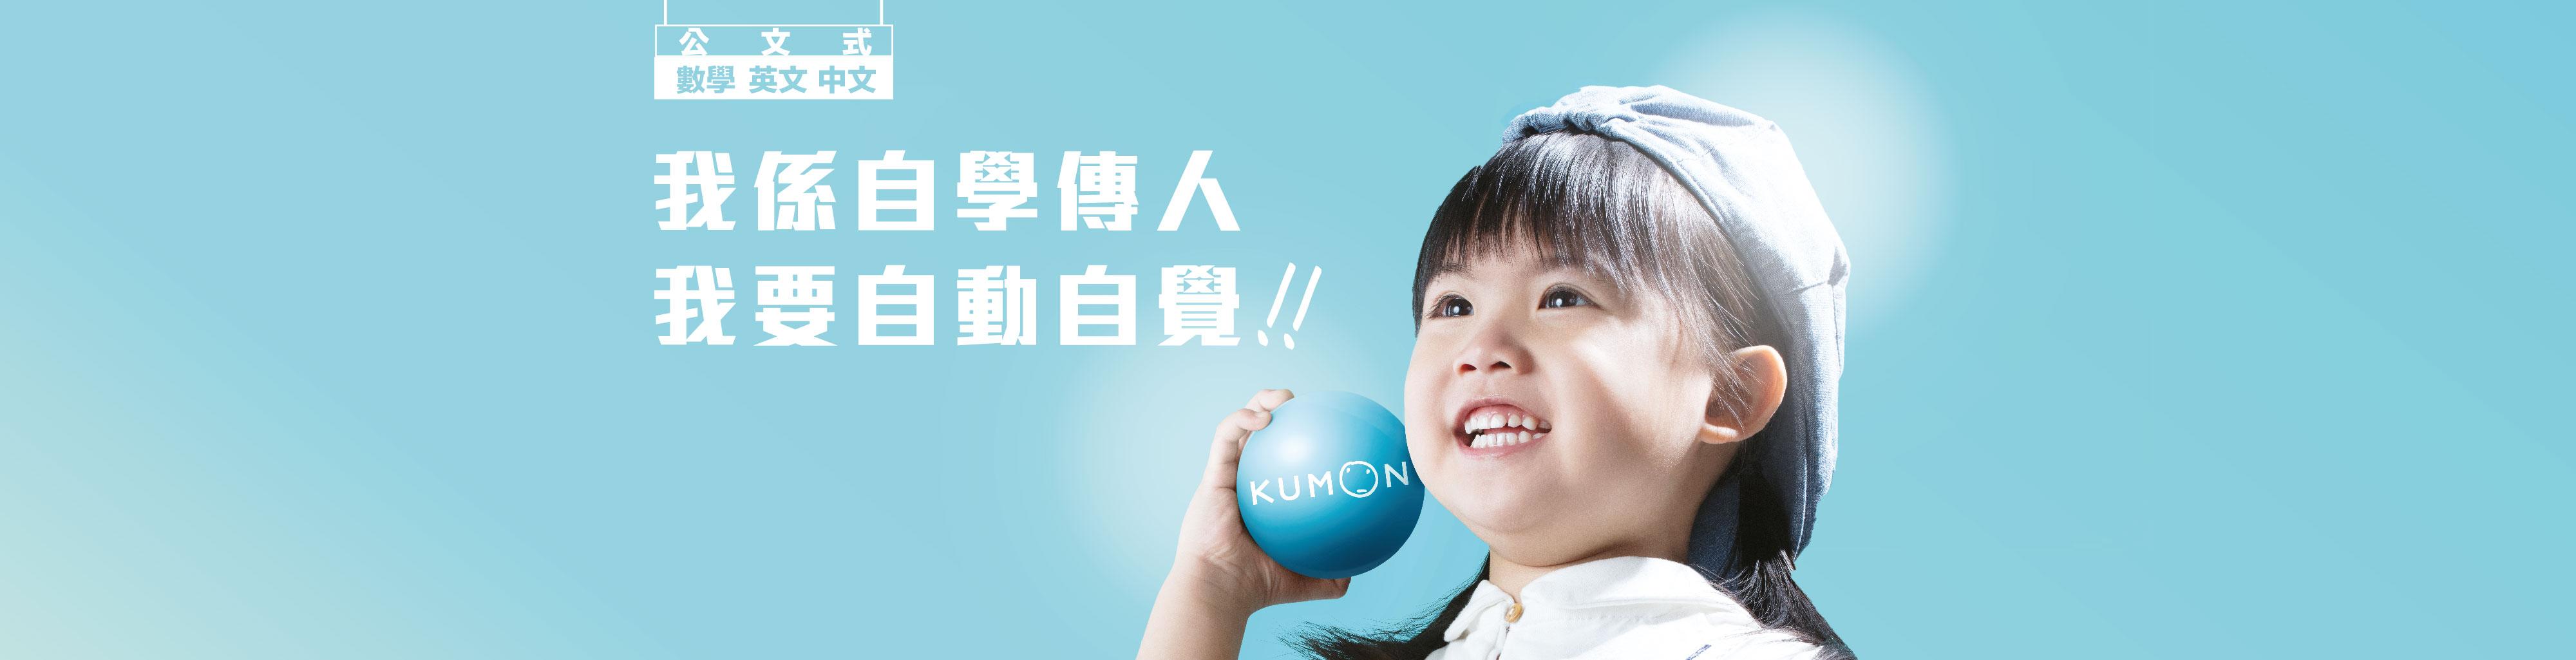 Themetc-kid_website-Banner-01